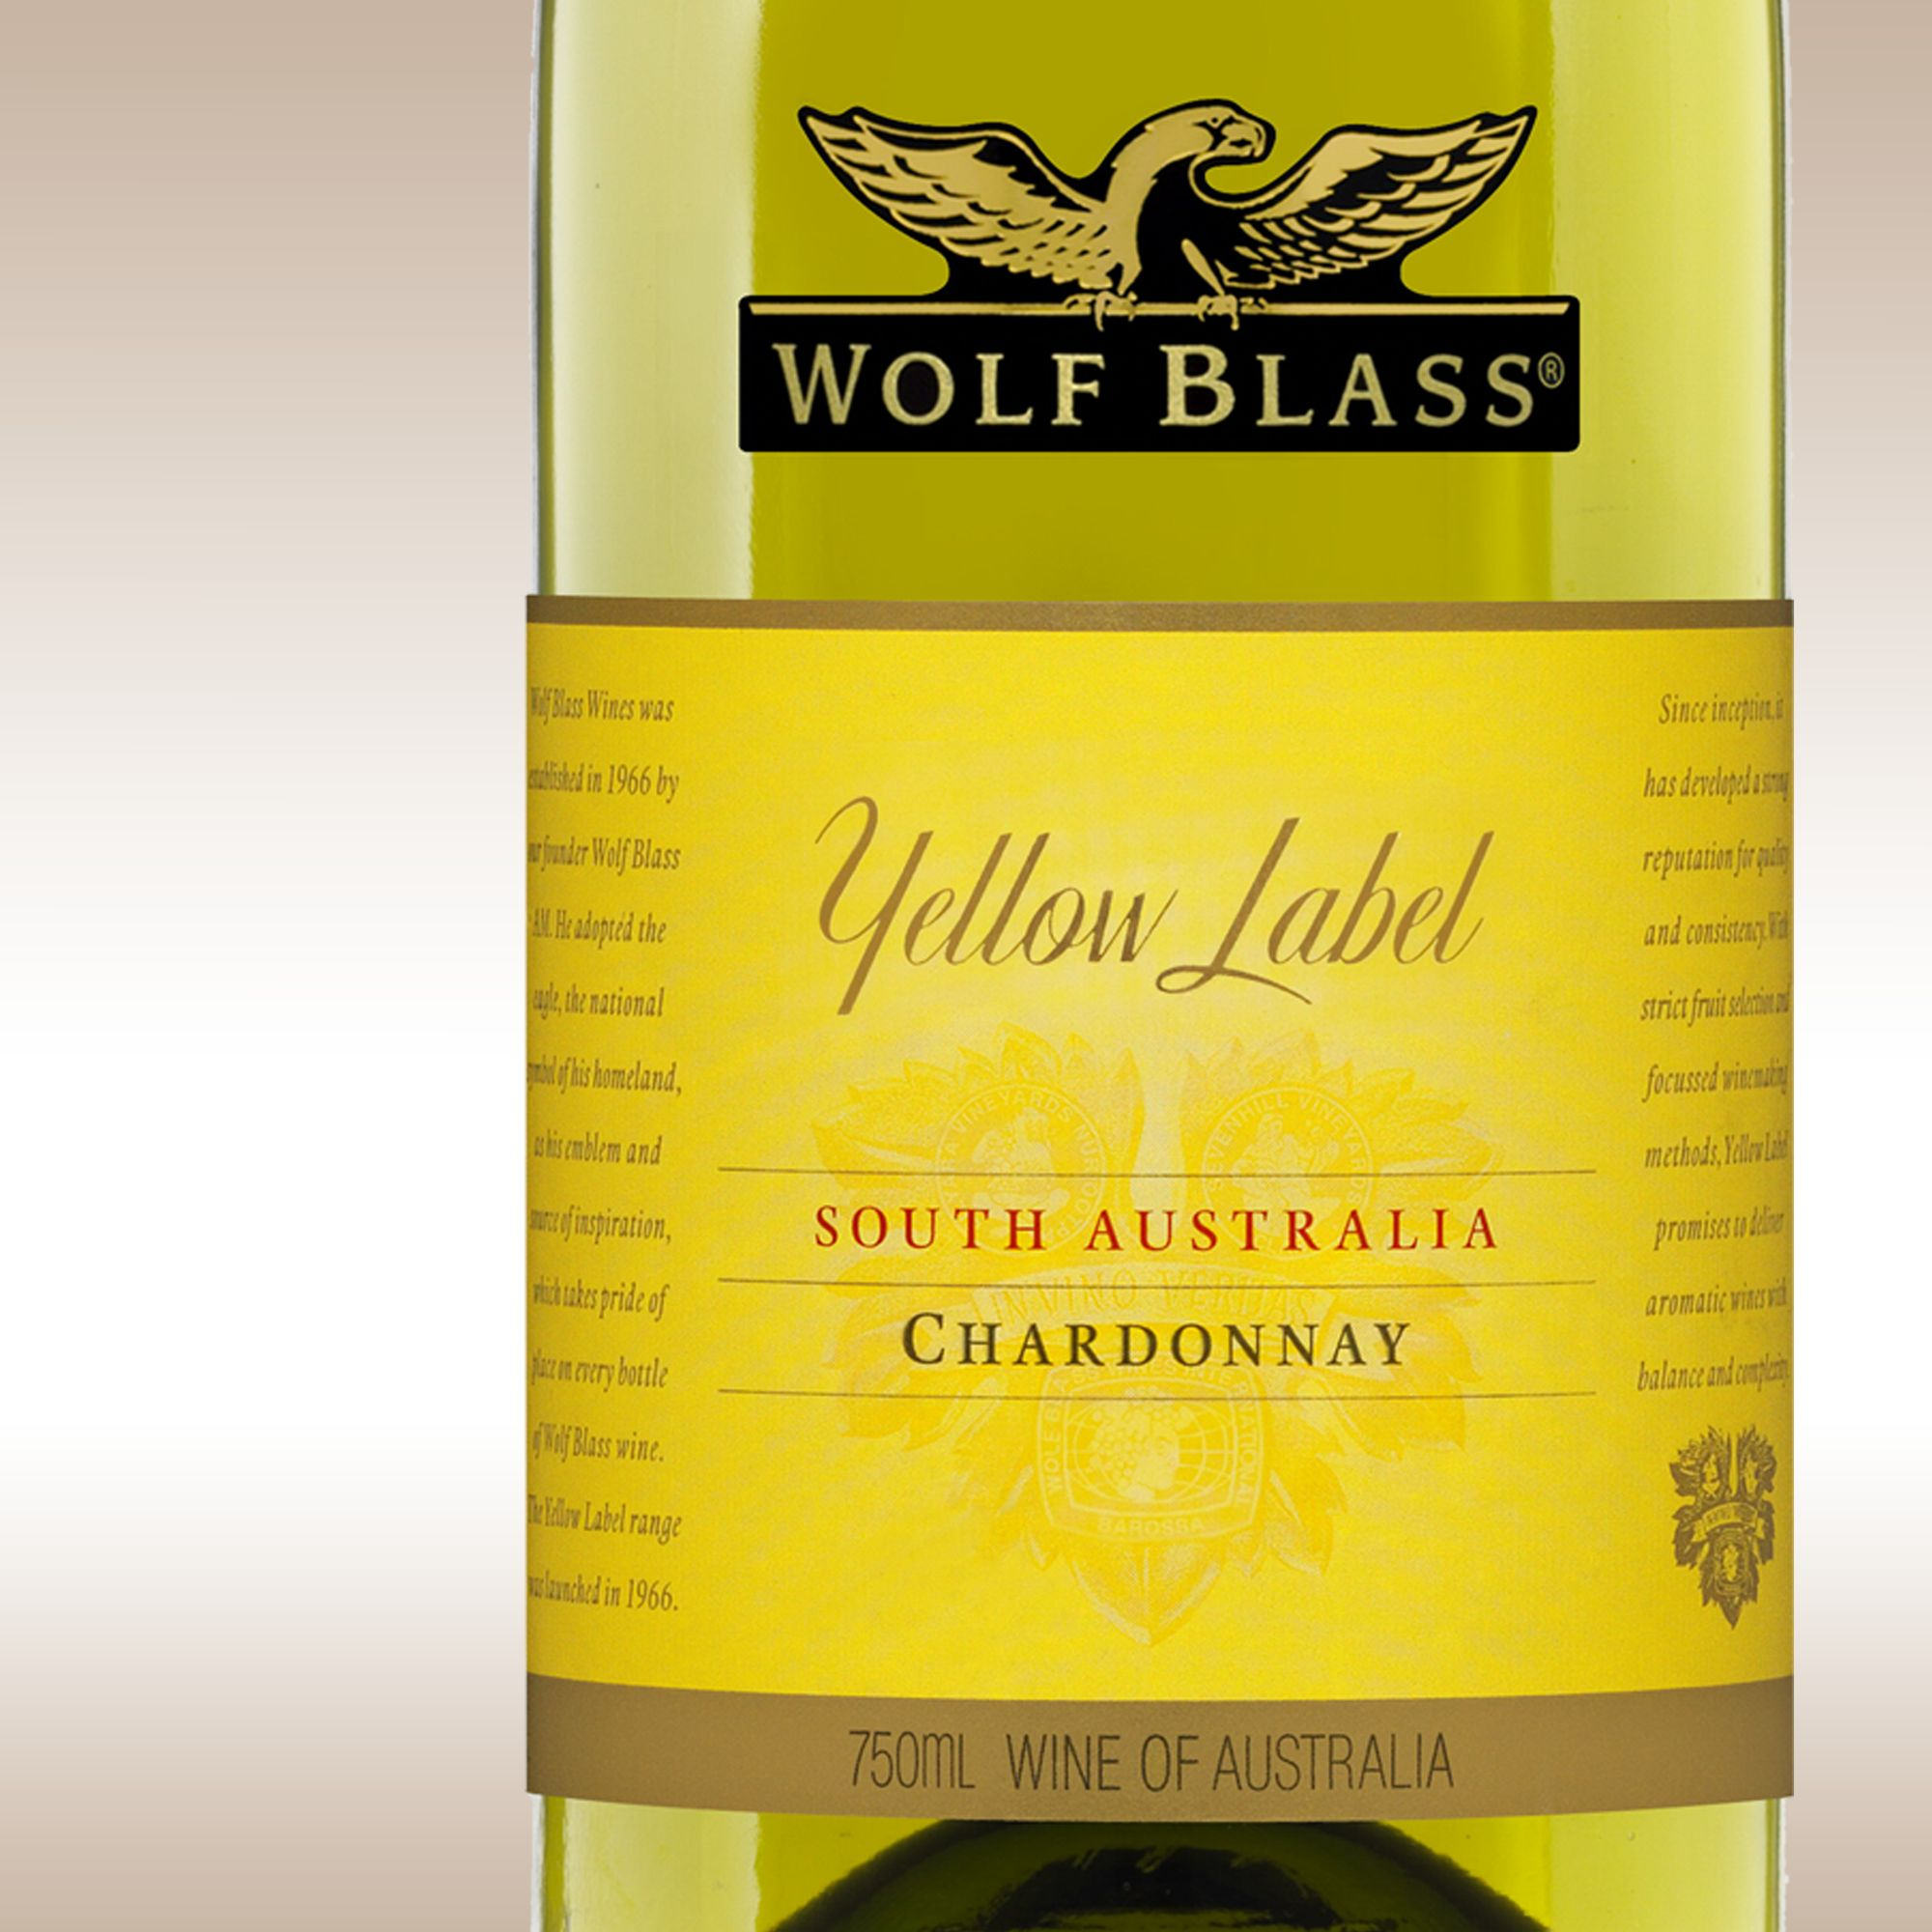 Wolf Blass Yellow Label Chardonnay 2008/09 S Australia